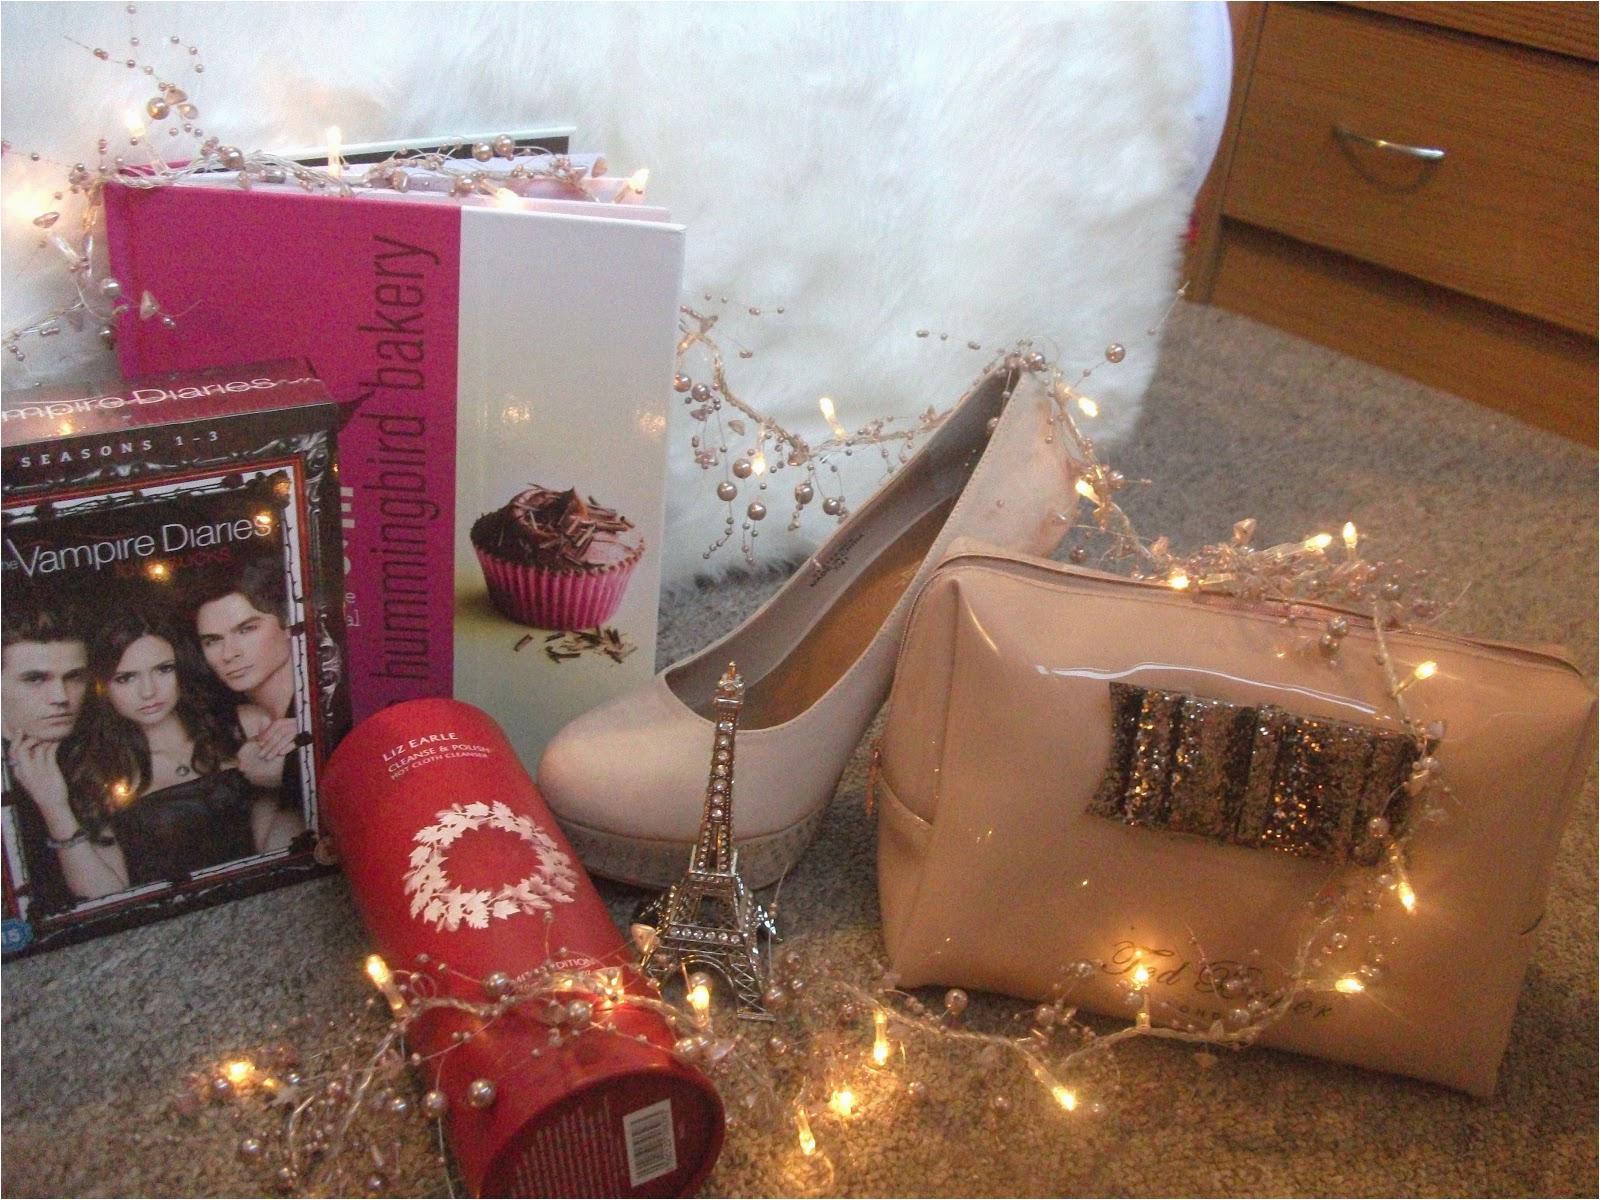 gift ideas for my boyfriends 18th